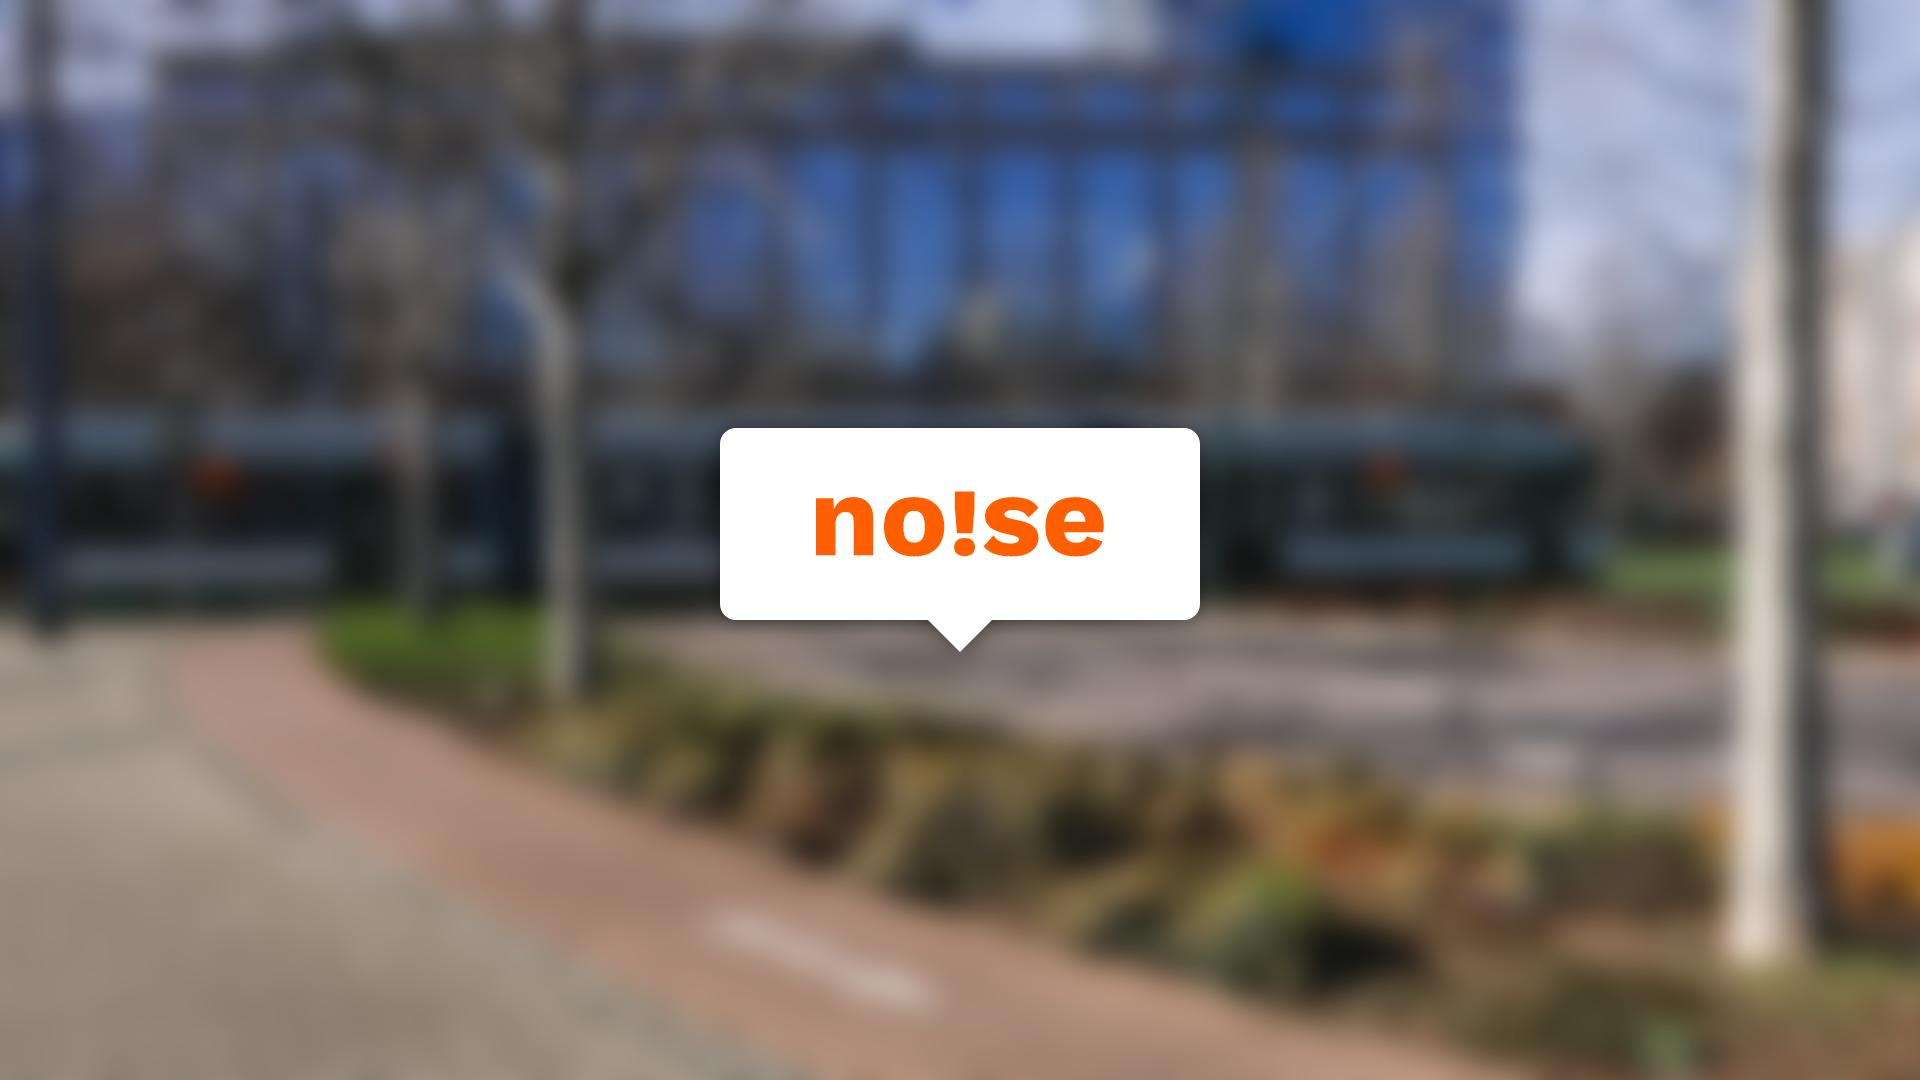 no!se - Lärmverschmutzung sichtbar machen